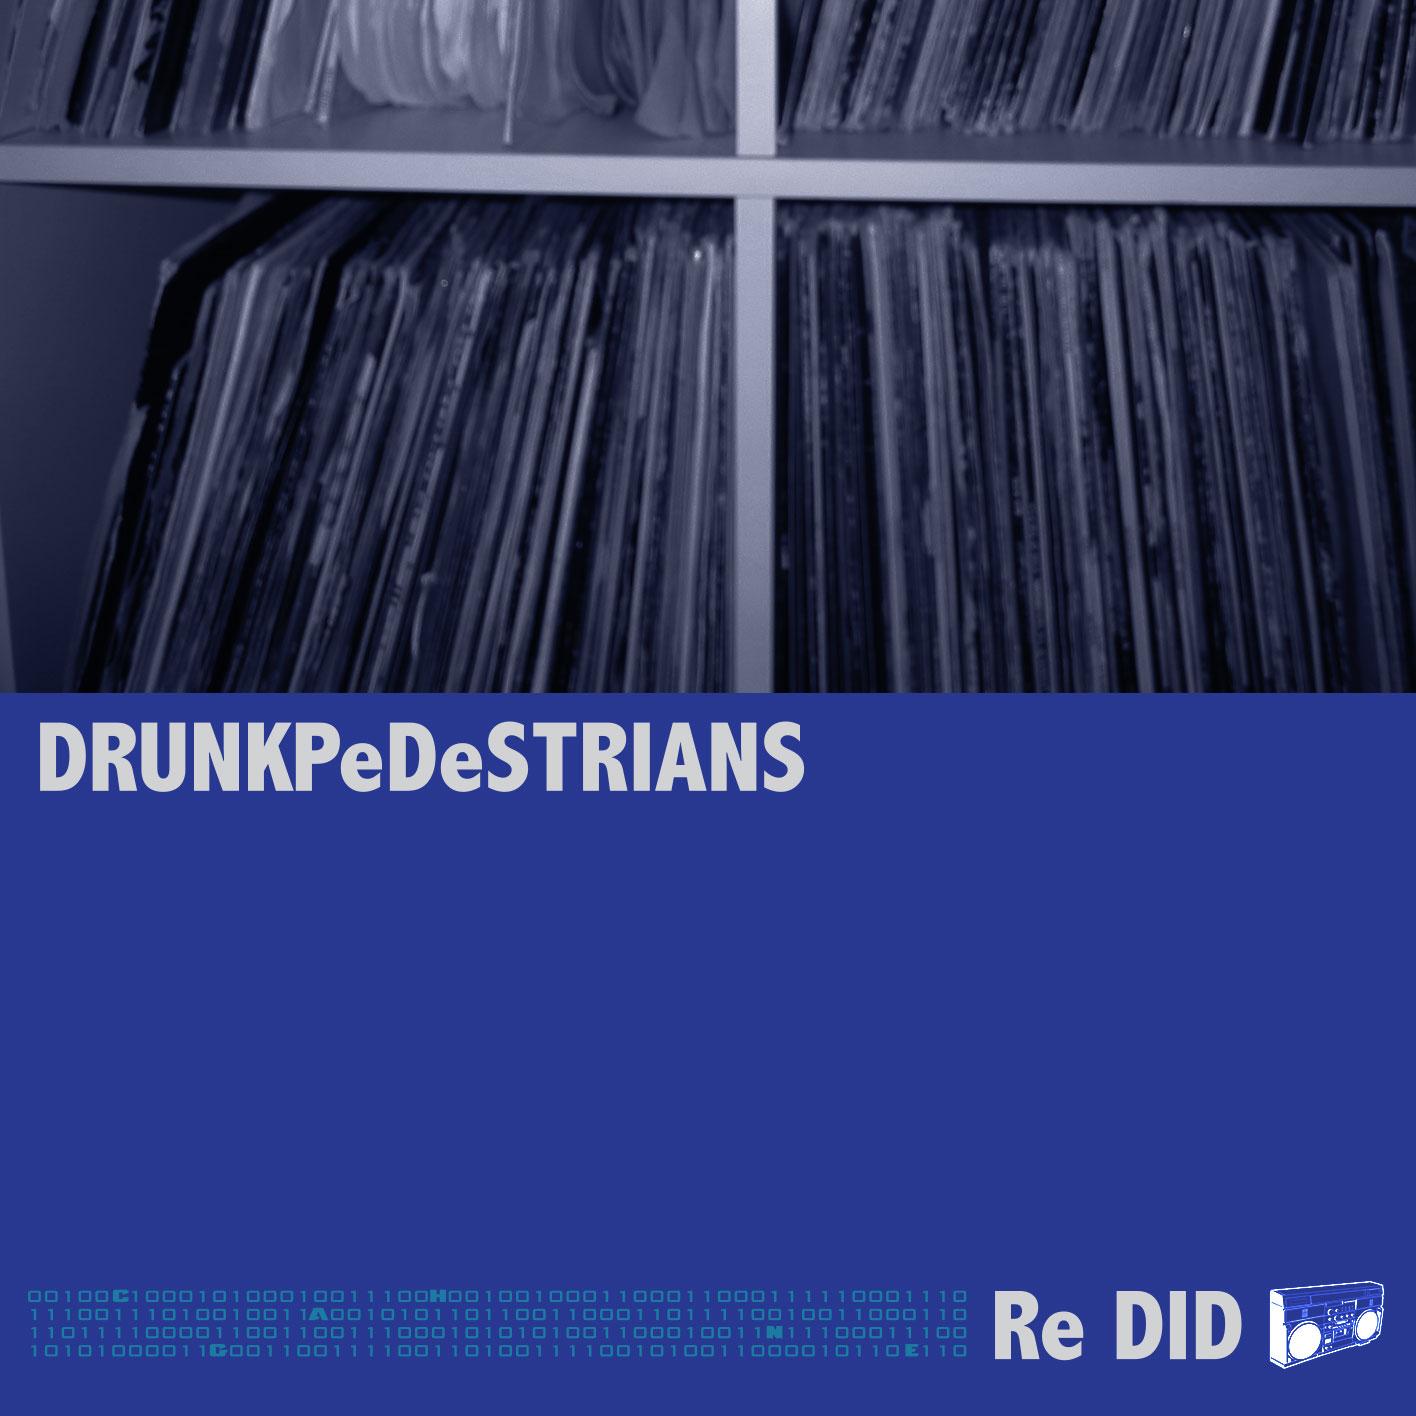 drunkpedestrian-Large.jpg